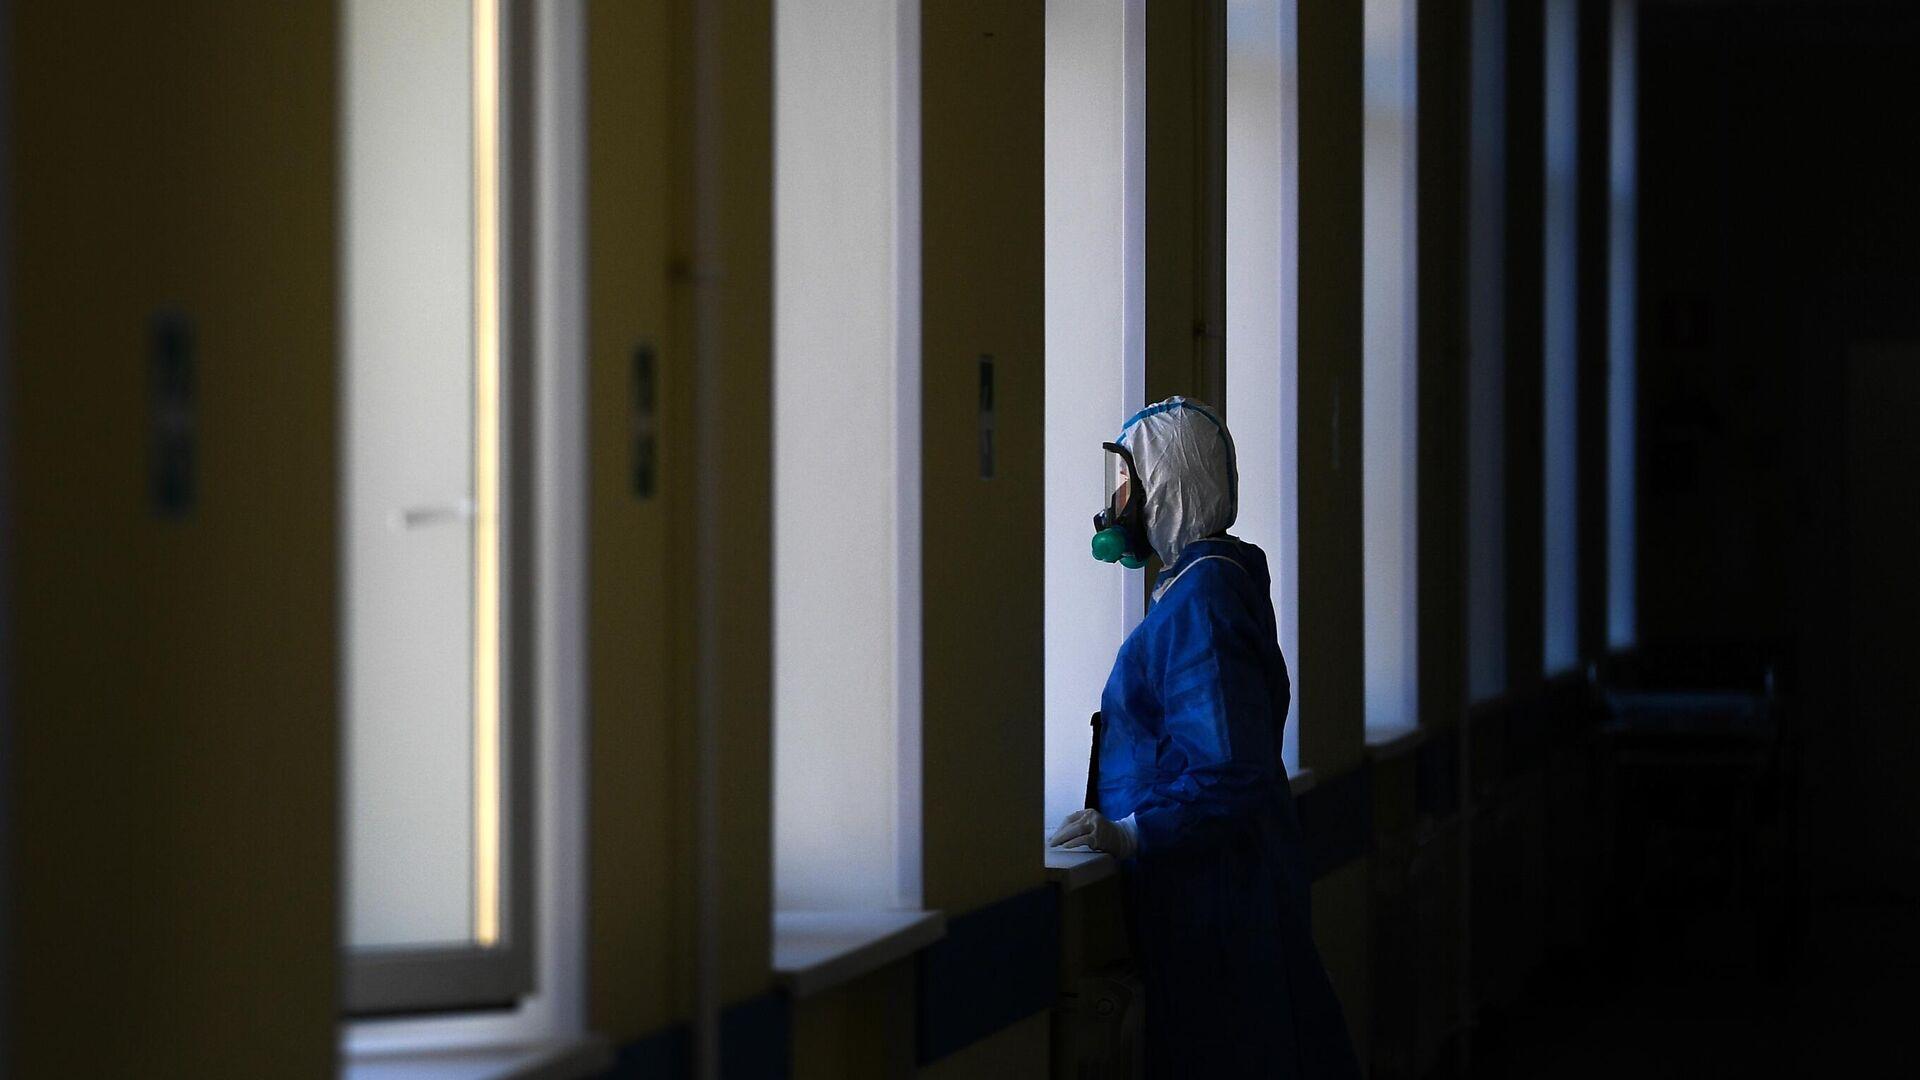 Врач у окна в госпитале COVID-19 в ЦИТО им. Н. Н. Приорова - РИА Новости, 1920, 10.12.2020